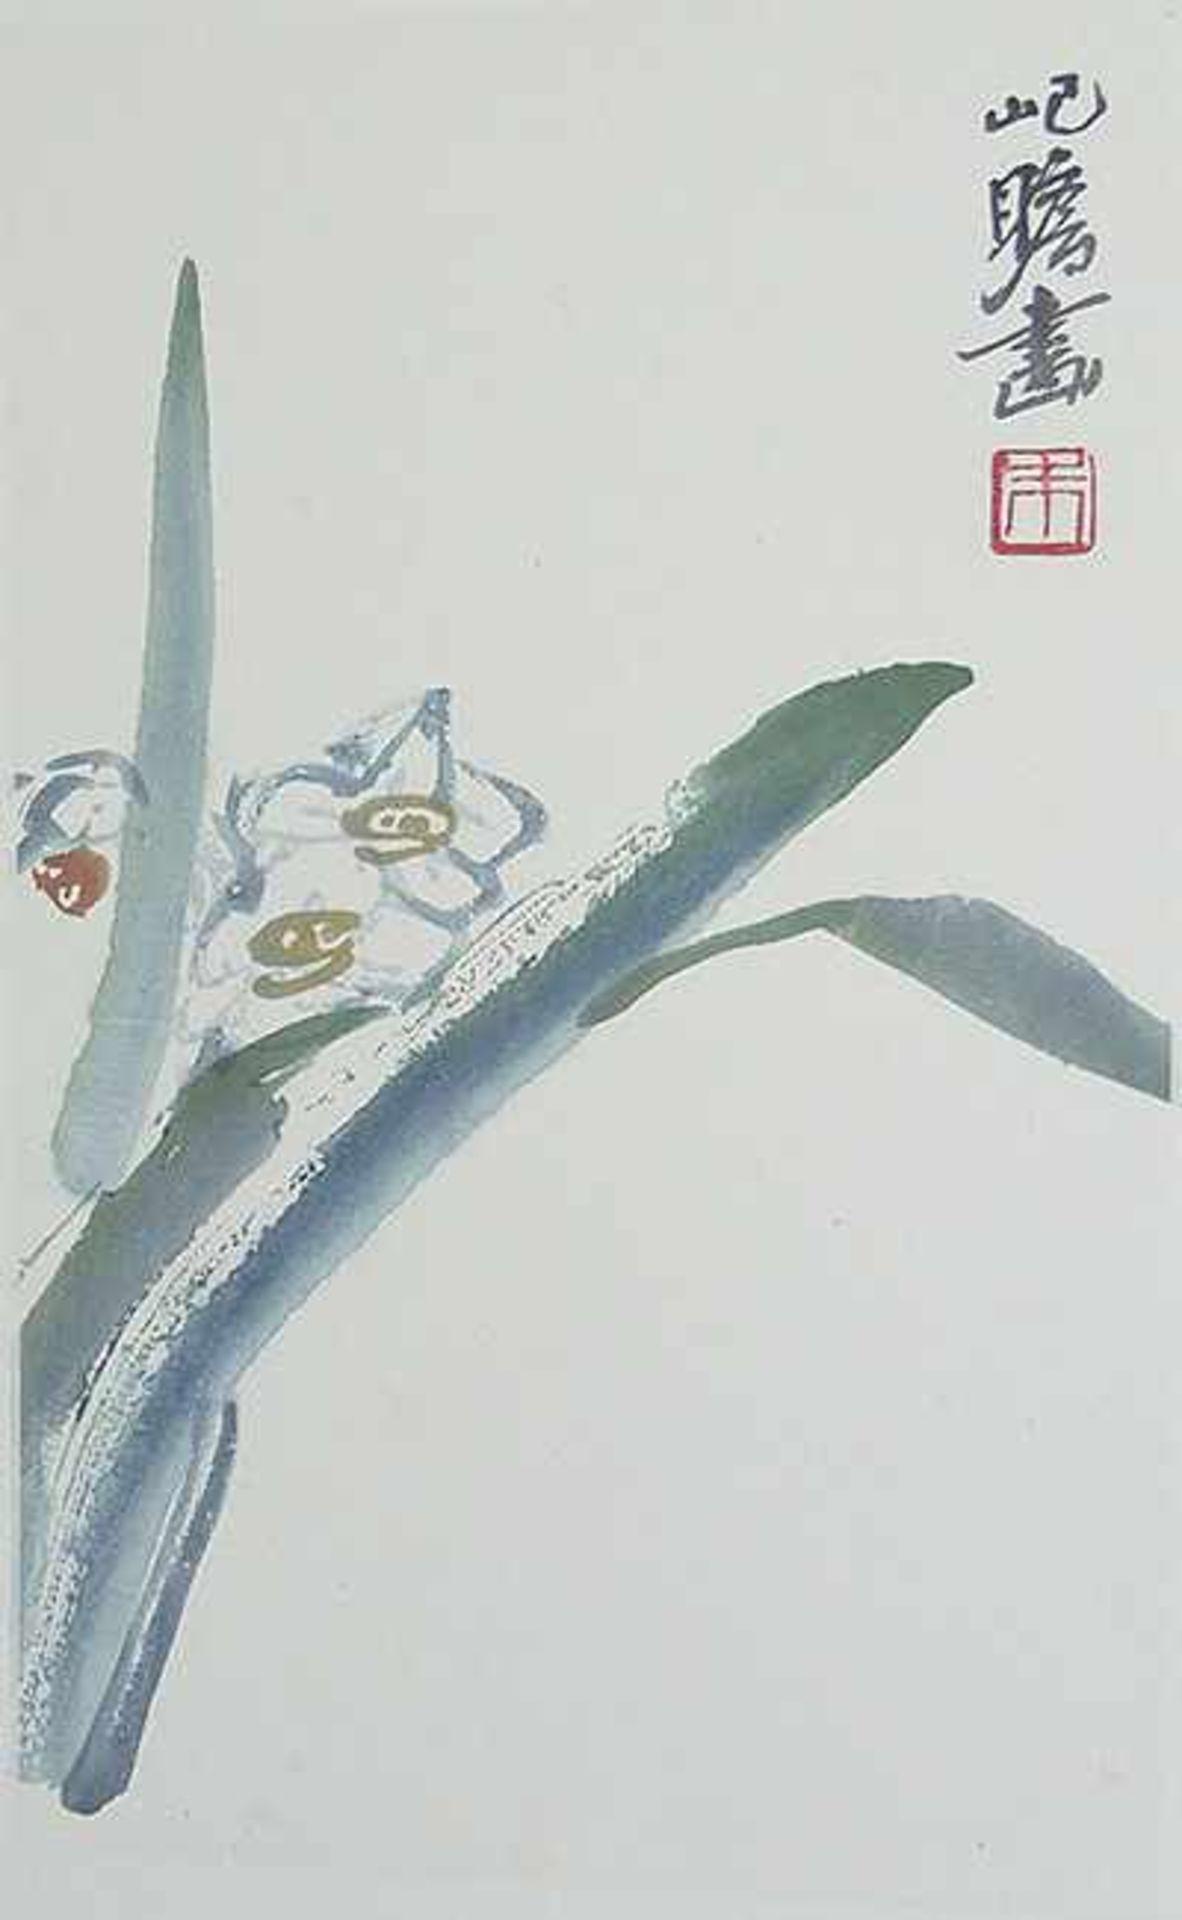 Zhu Jizhang (20. Jh.) Aquarellfarben-Holzschnitt. China, 20th cent. Darstellung einer Narzisse mit - Image 2 of 2